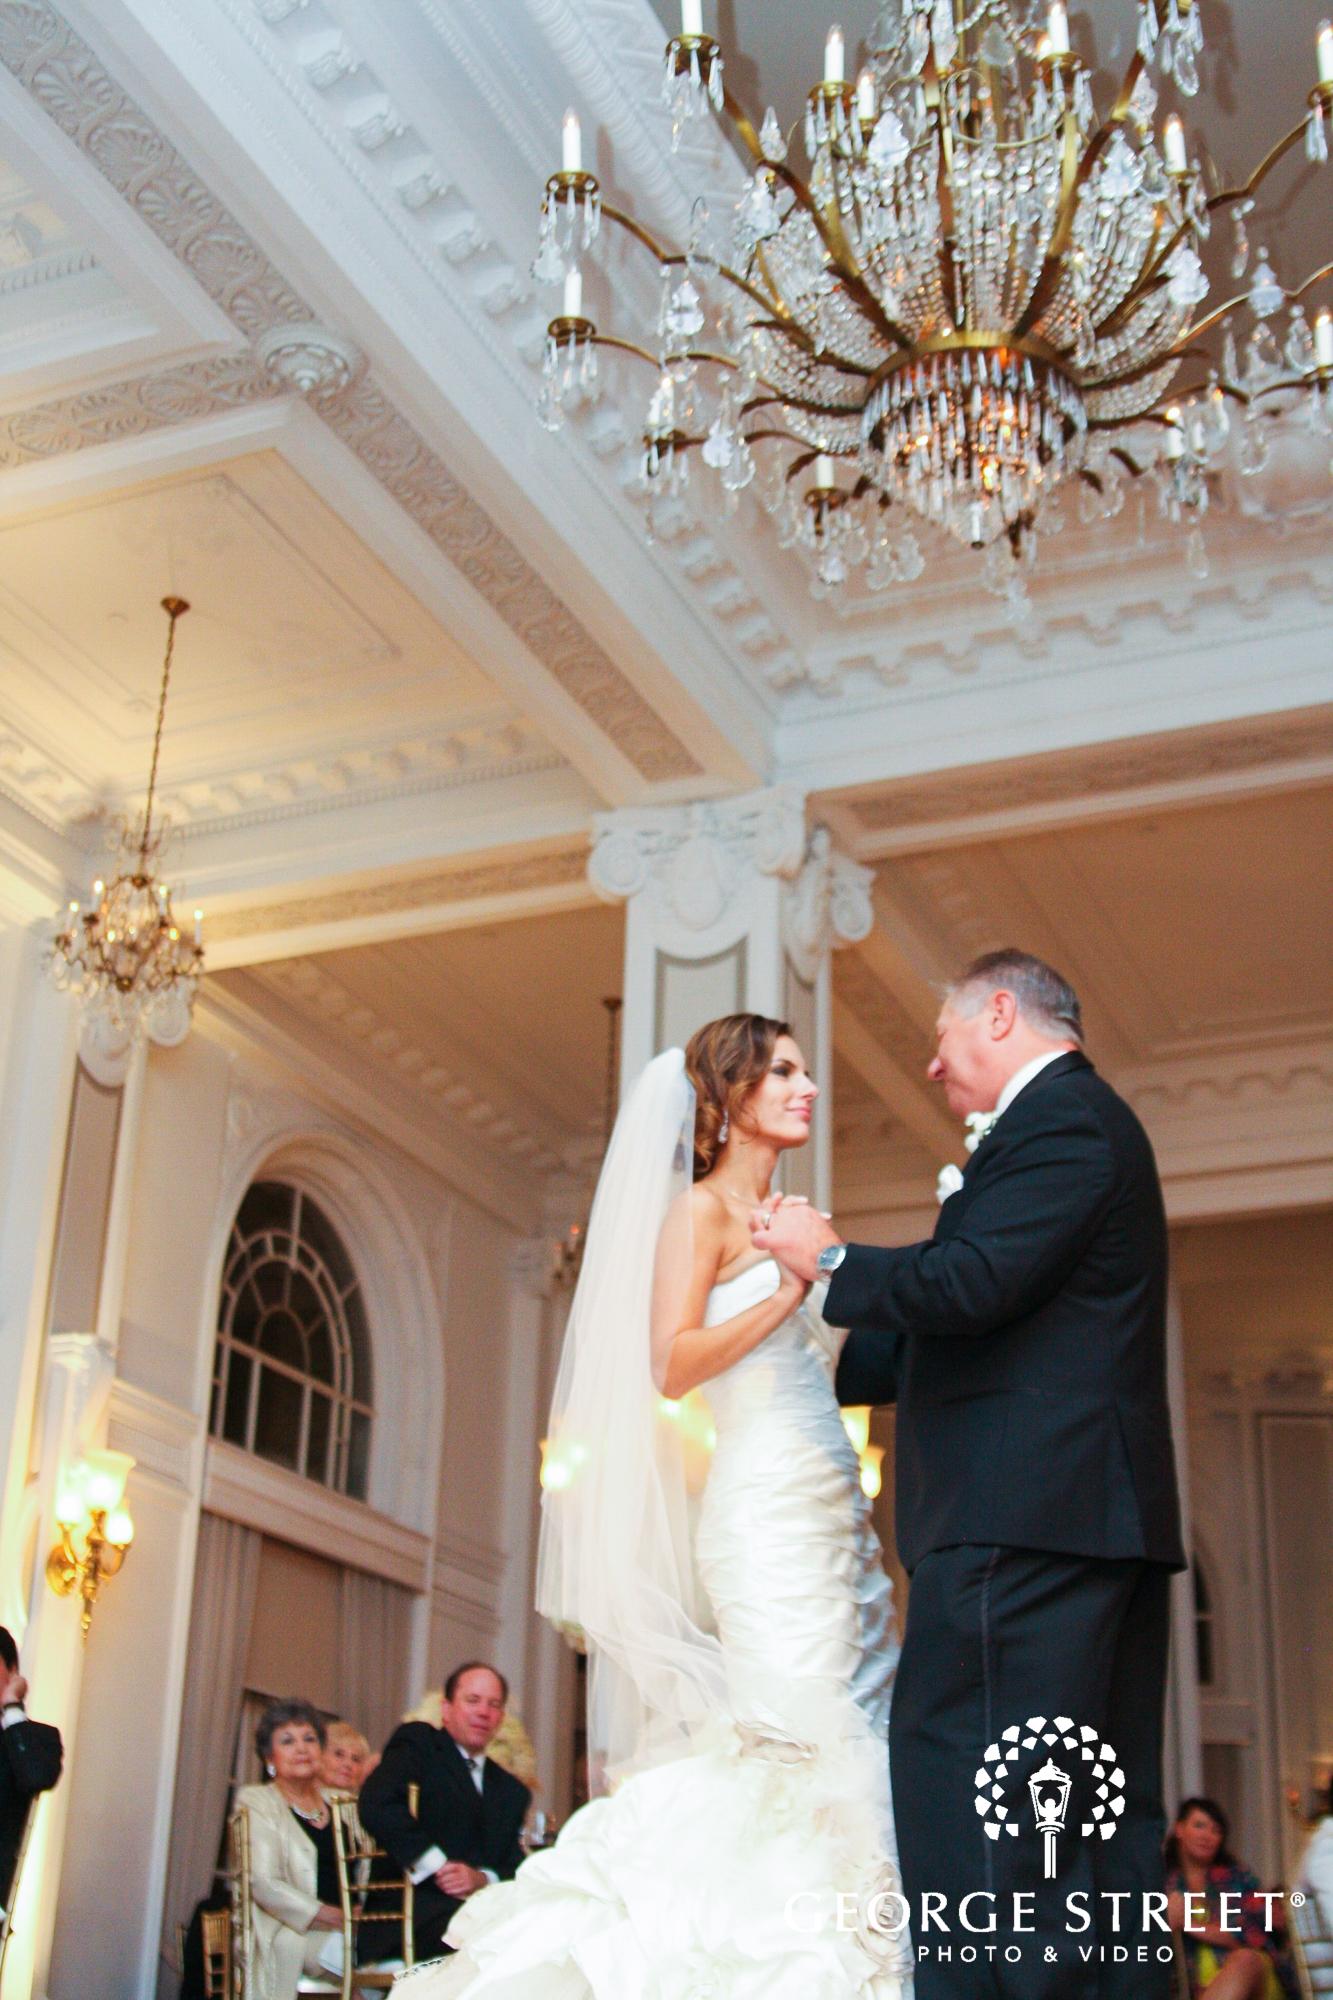 The Georgian Terrace Hotel Wedding Photographer George